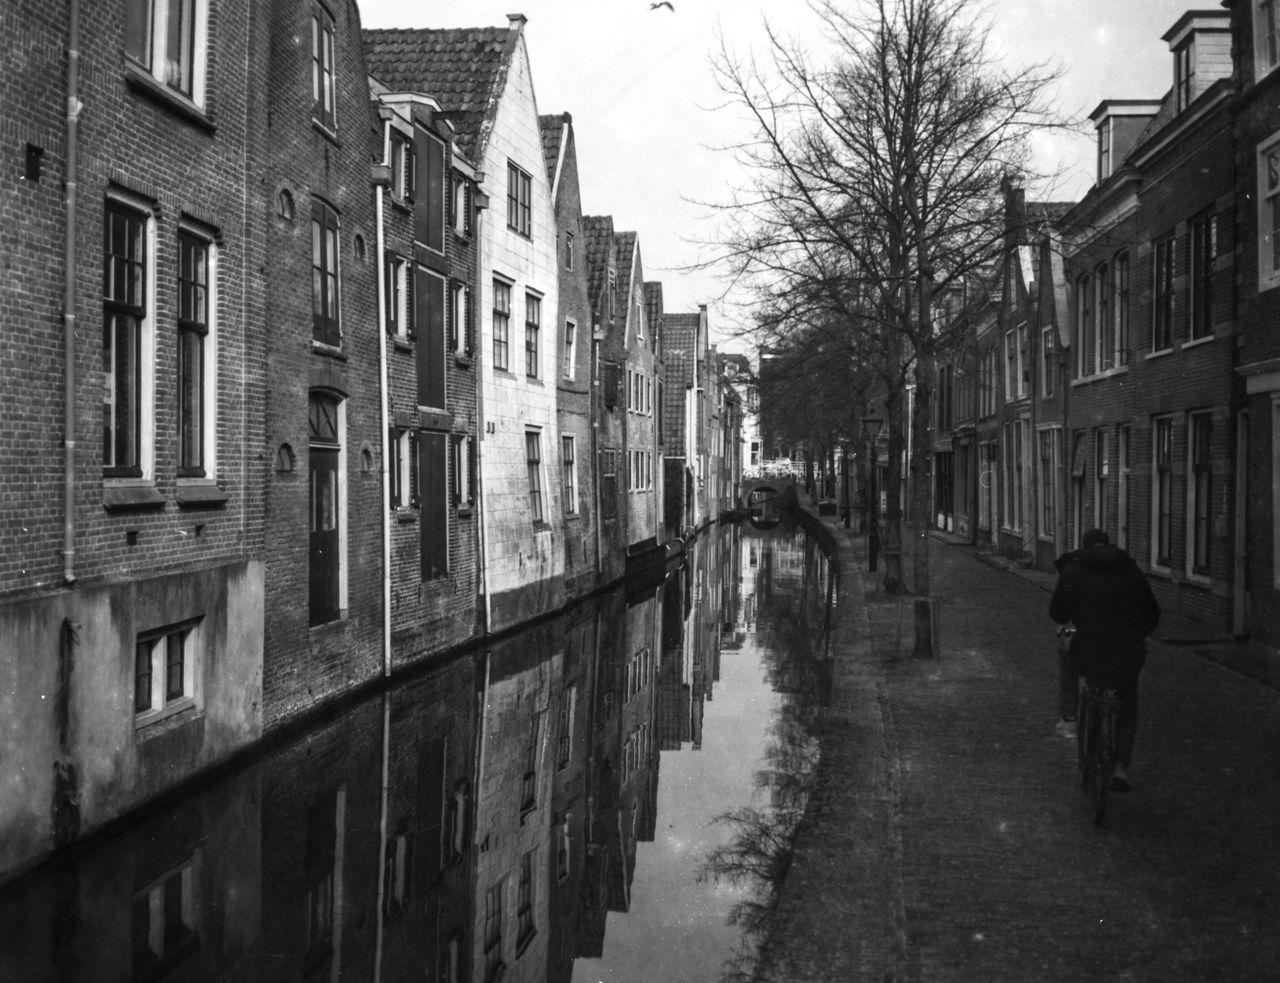 Vintage Alkmaar Alkmaar Analog Architecture B&w Blackandwhite Building Exterior Built Structure City Day Film Monochrome Netherlands Nostalgia Outdoors Tree Vintage